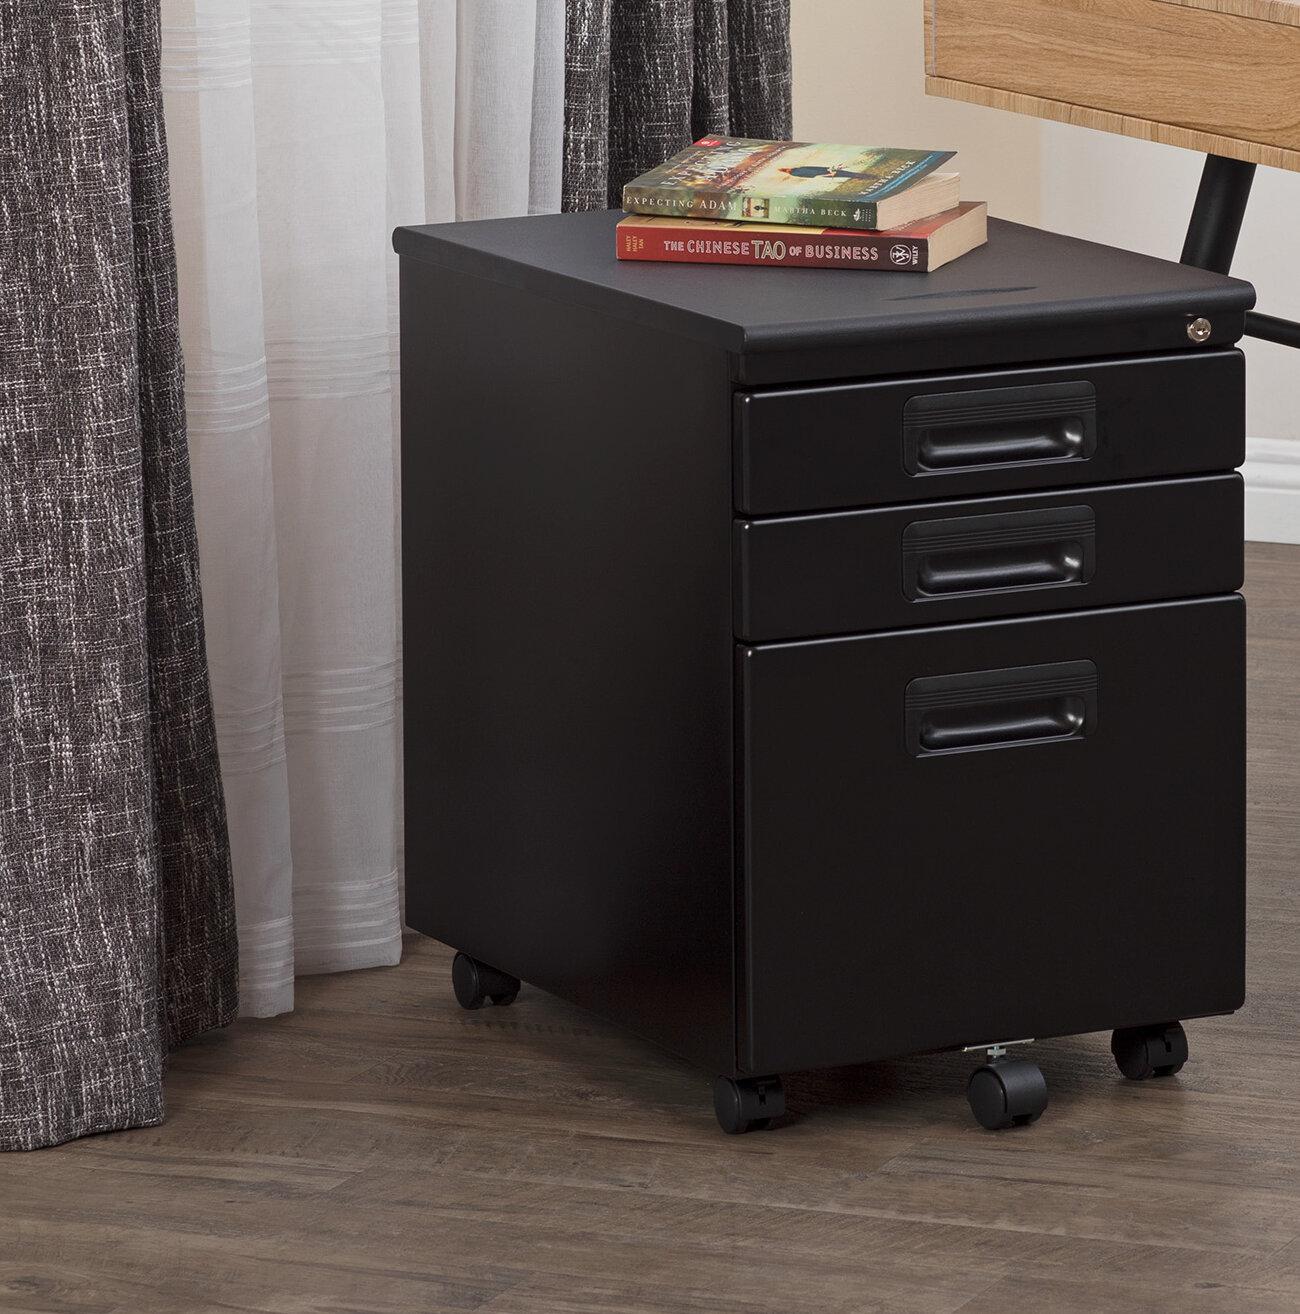 Calico Designs Metal Rolling 3 Drawer Mobile Vertical Filing Cabinet Reviews Wayfair